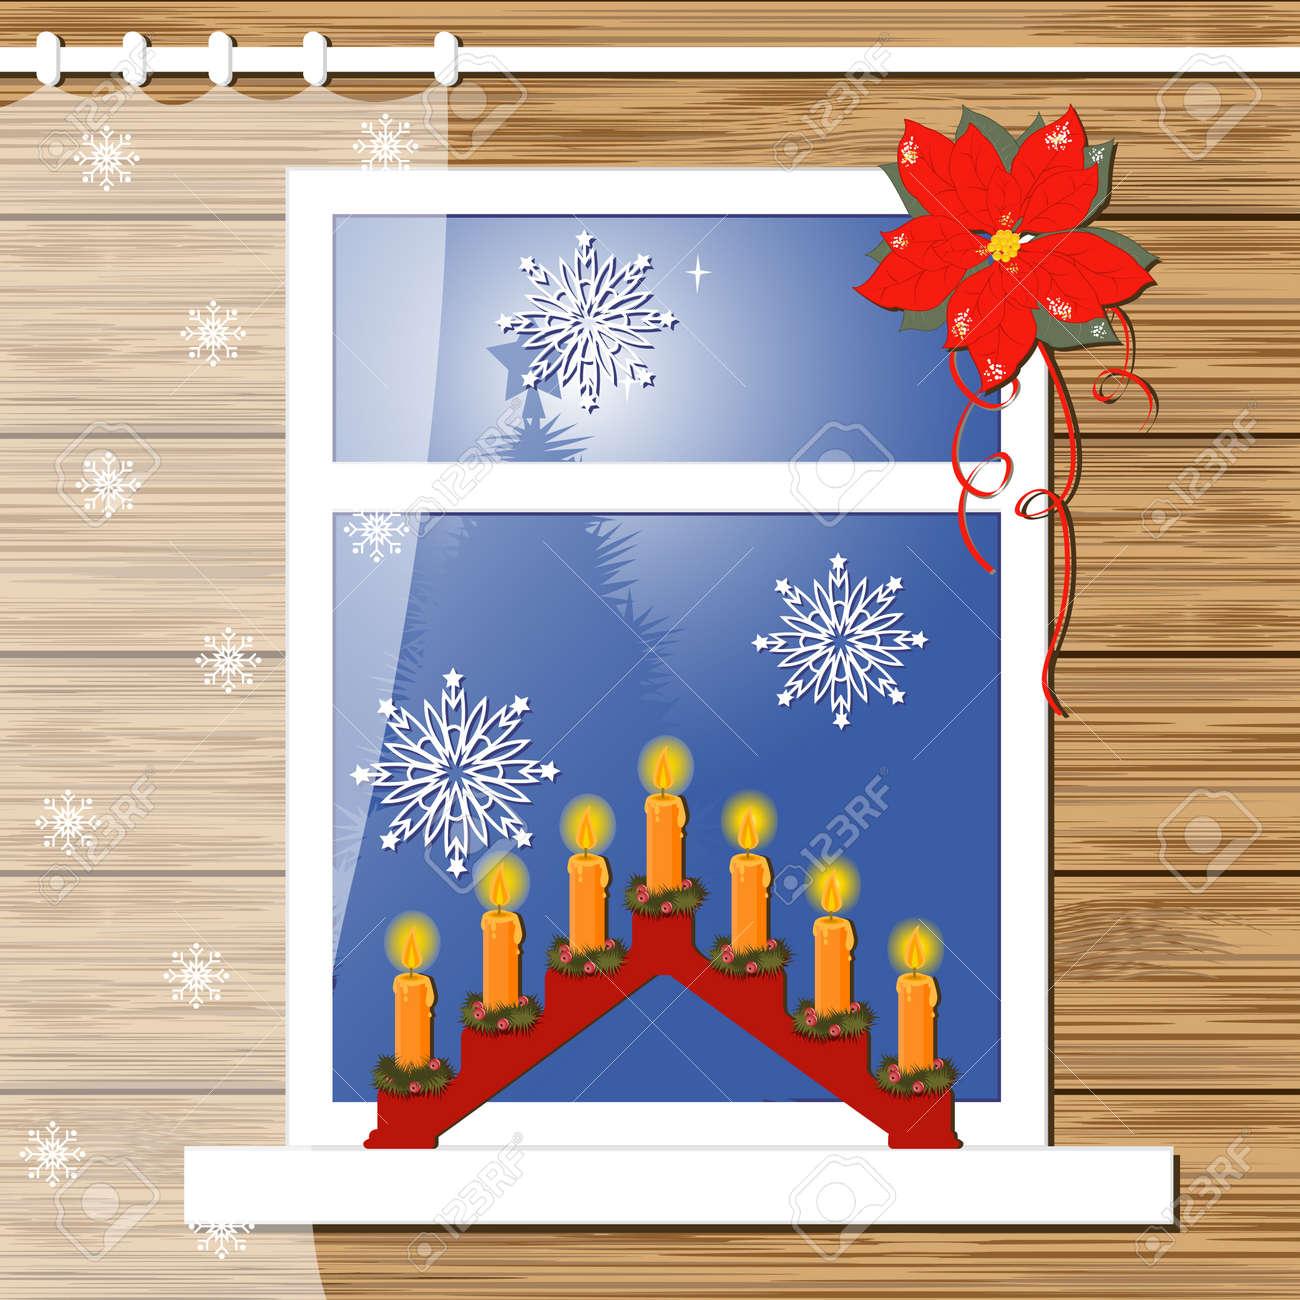 Christmas greeting card with decor windows Stock Vector - 15968510